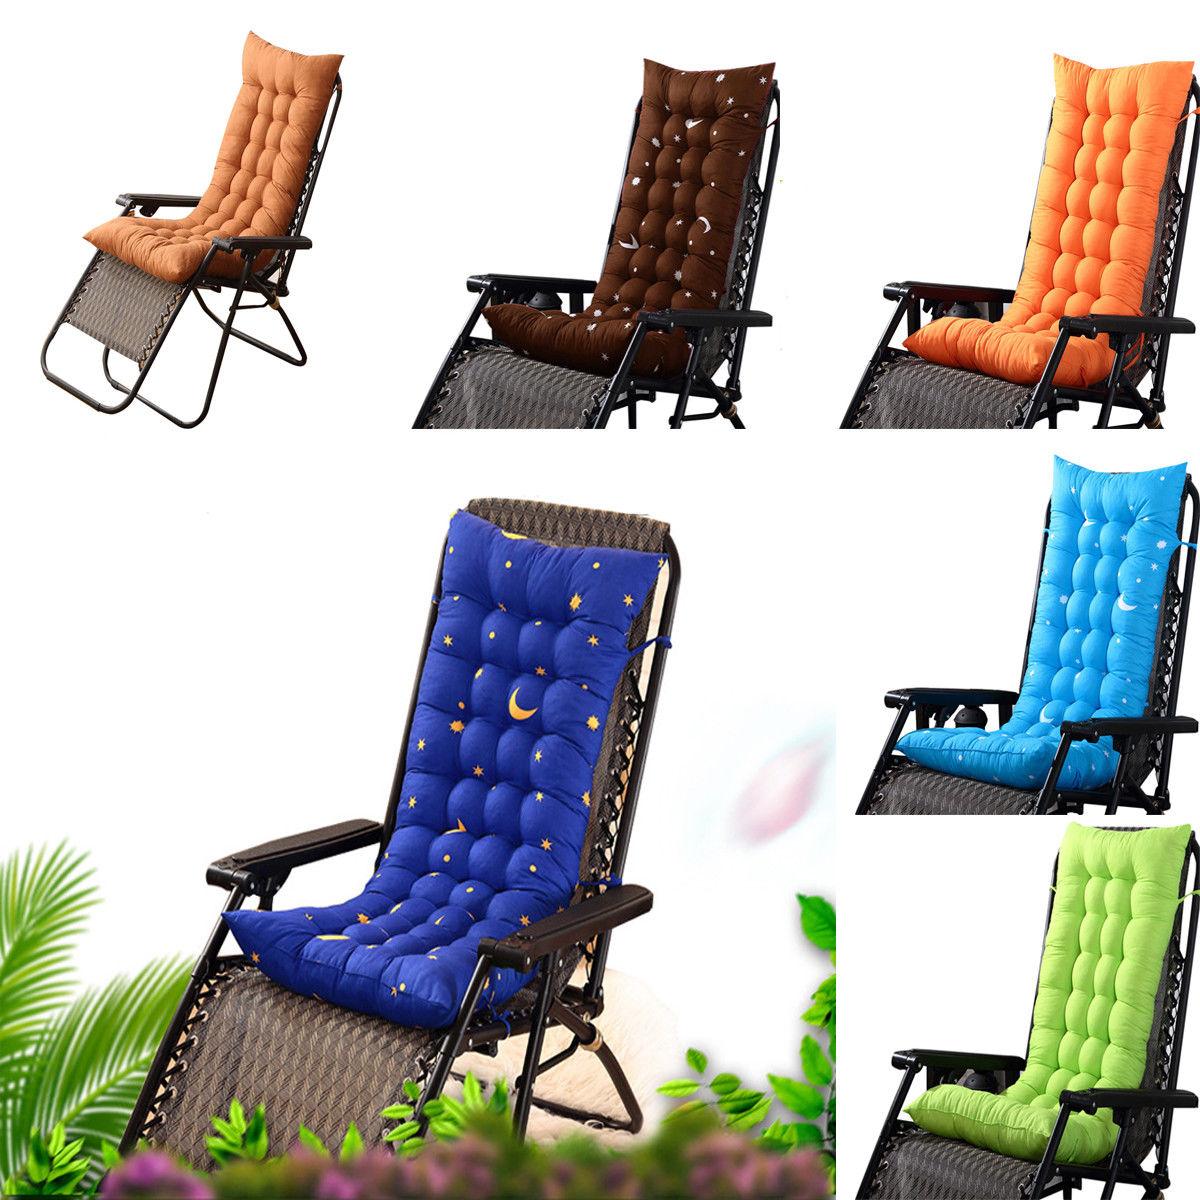 Hot Deck Chair Cushion Thick Outdoor Patio Backyard Garden Lounge Seat  Padding G